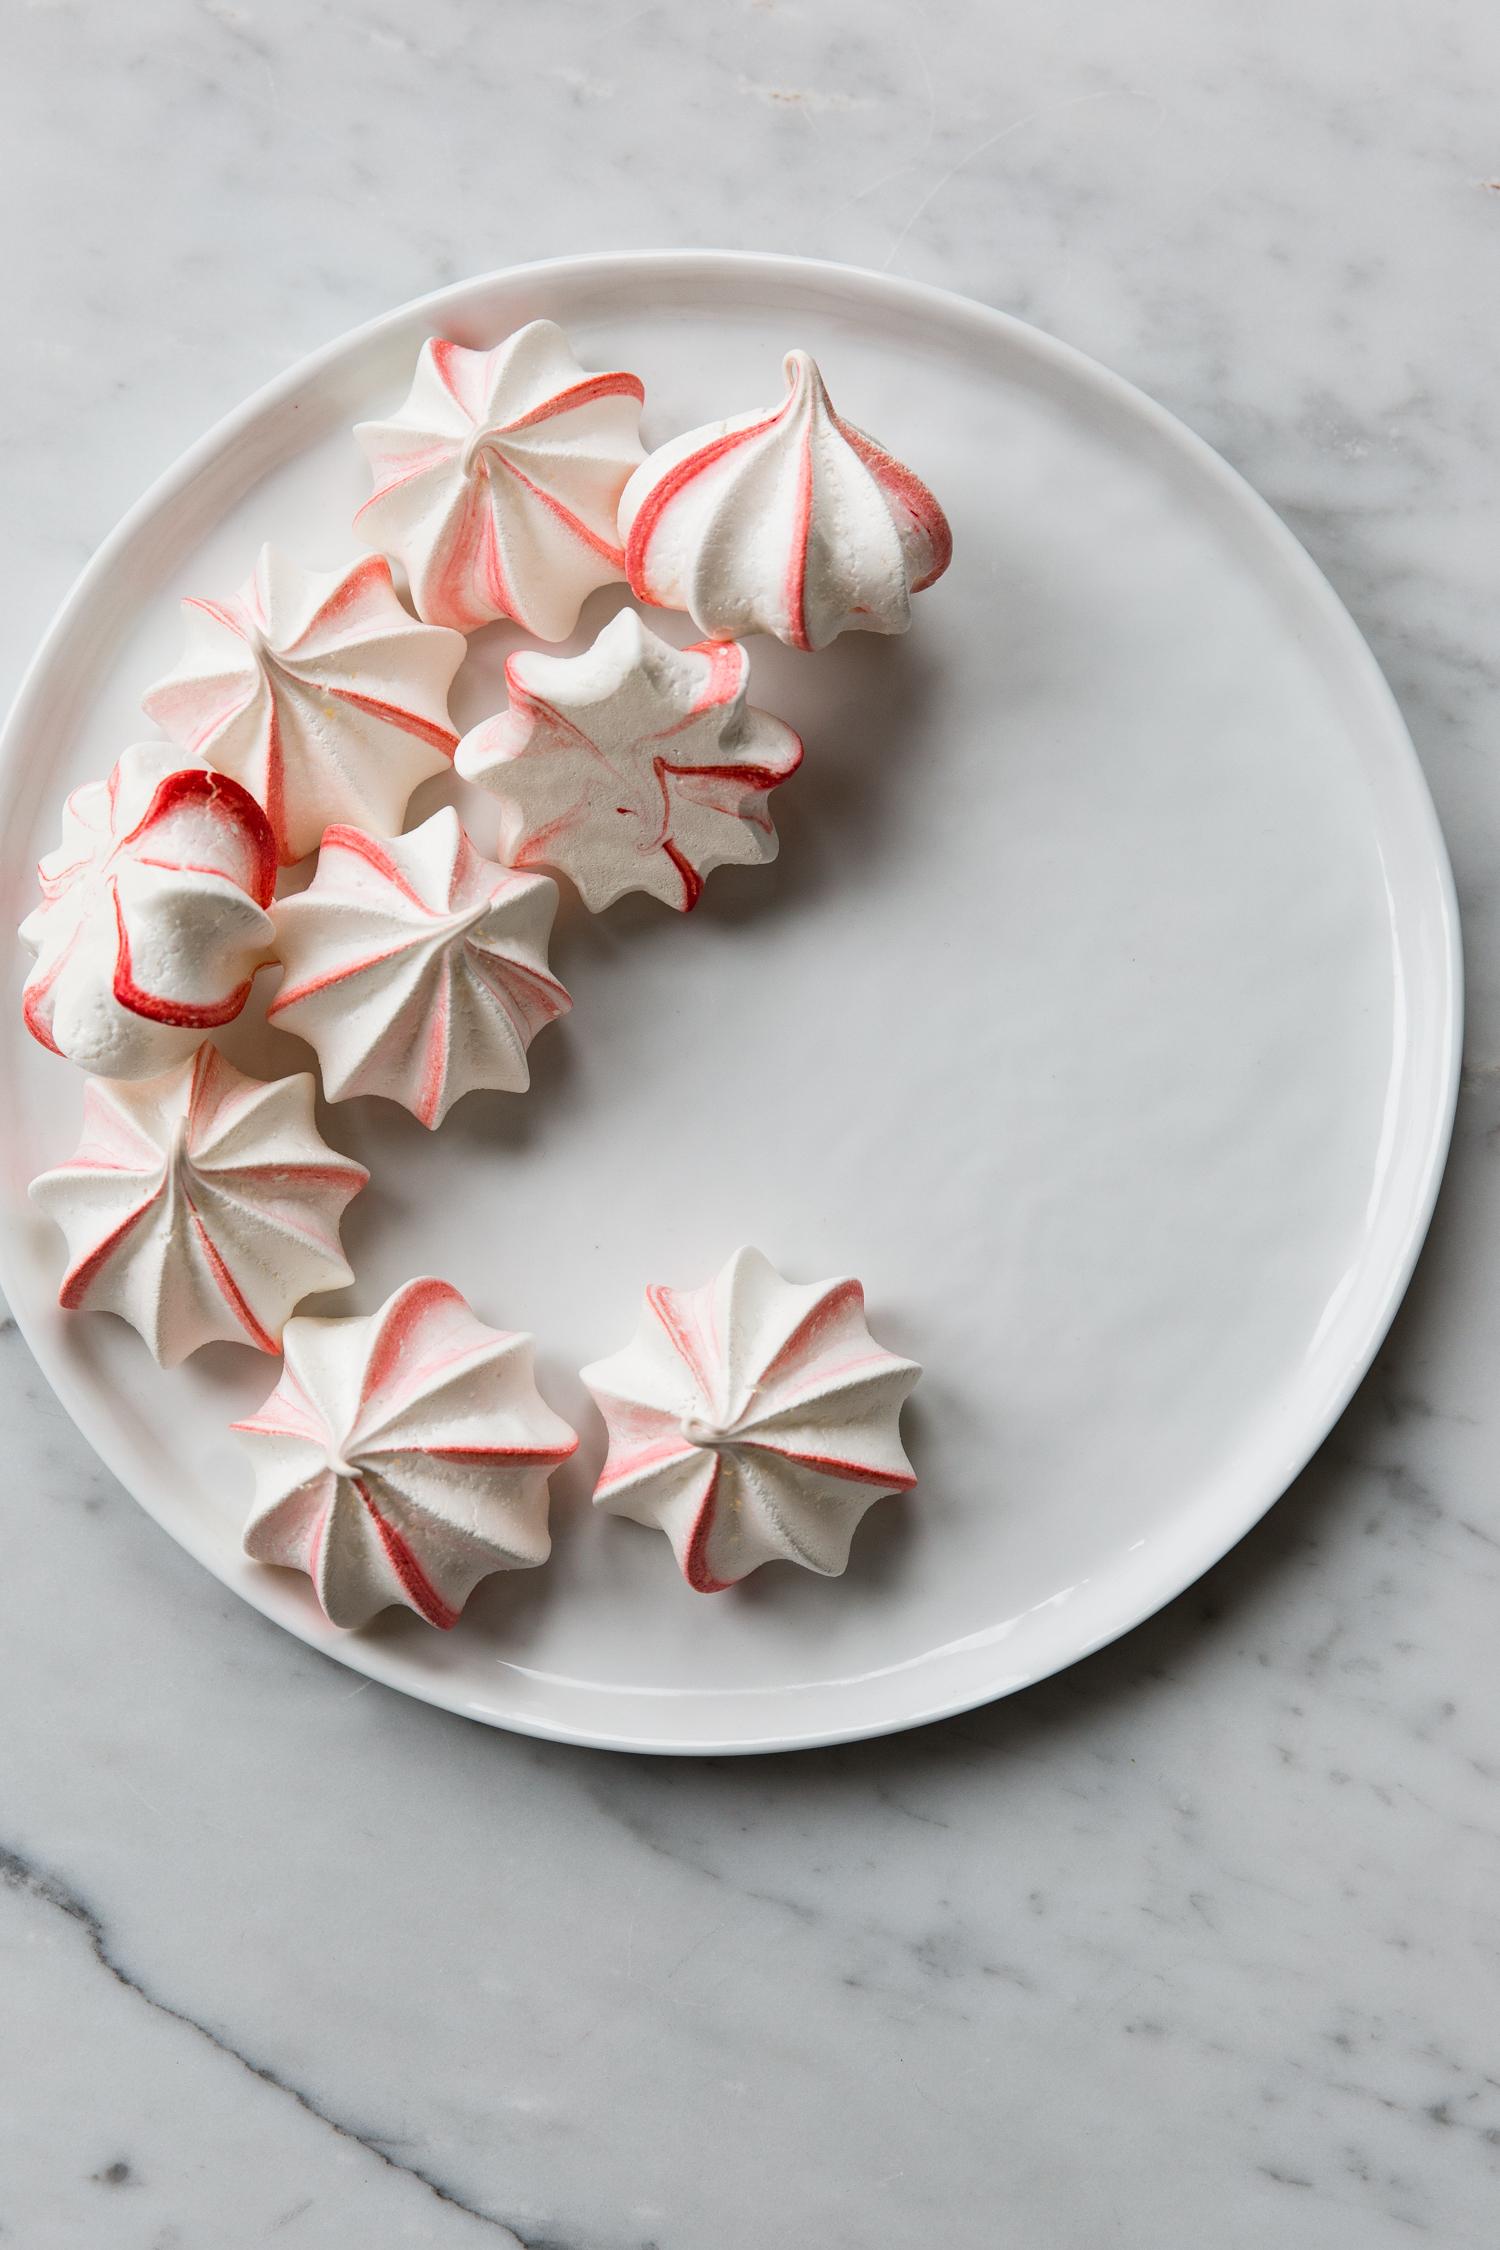 erinscottphotography_holidaycookies-10.jpg